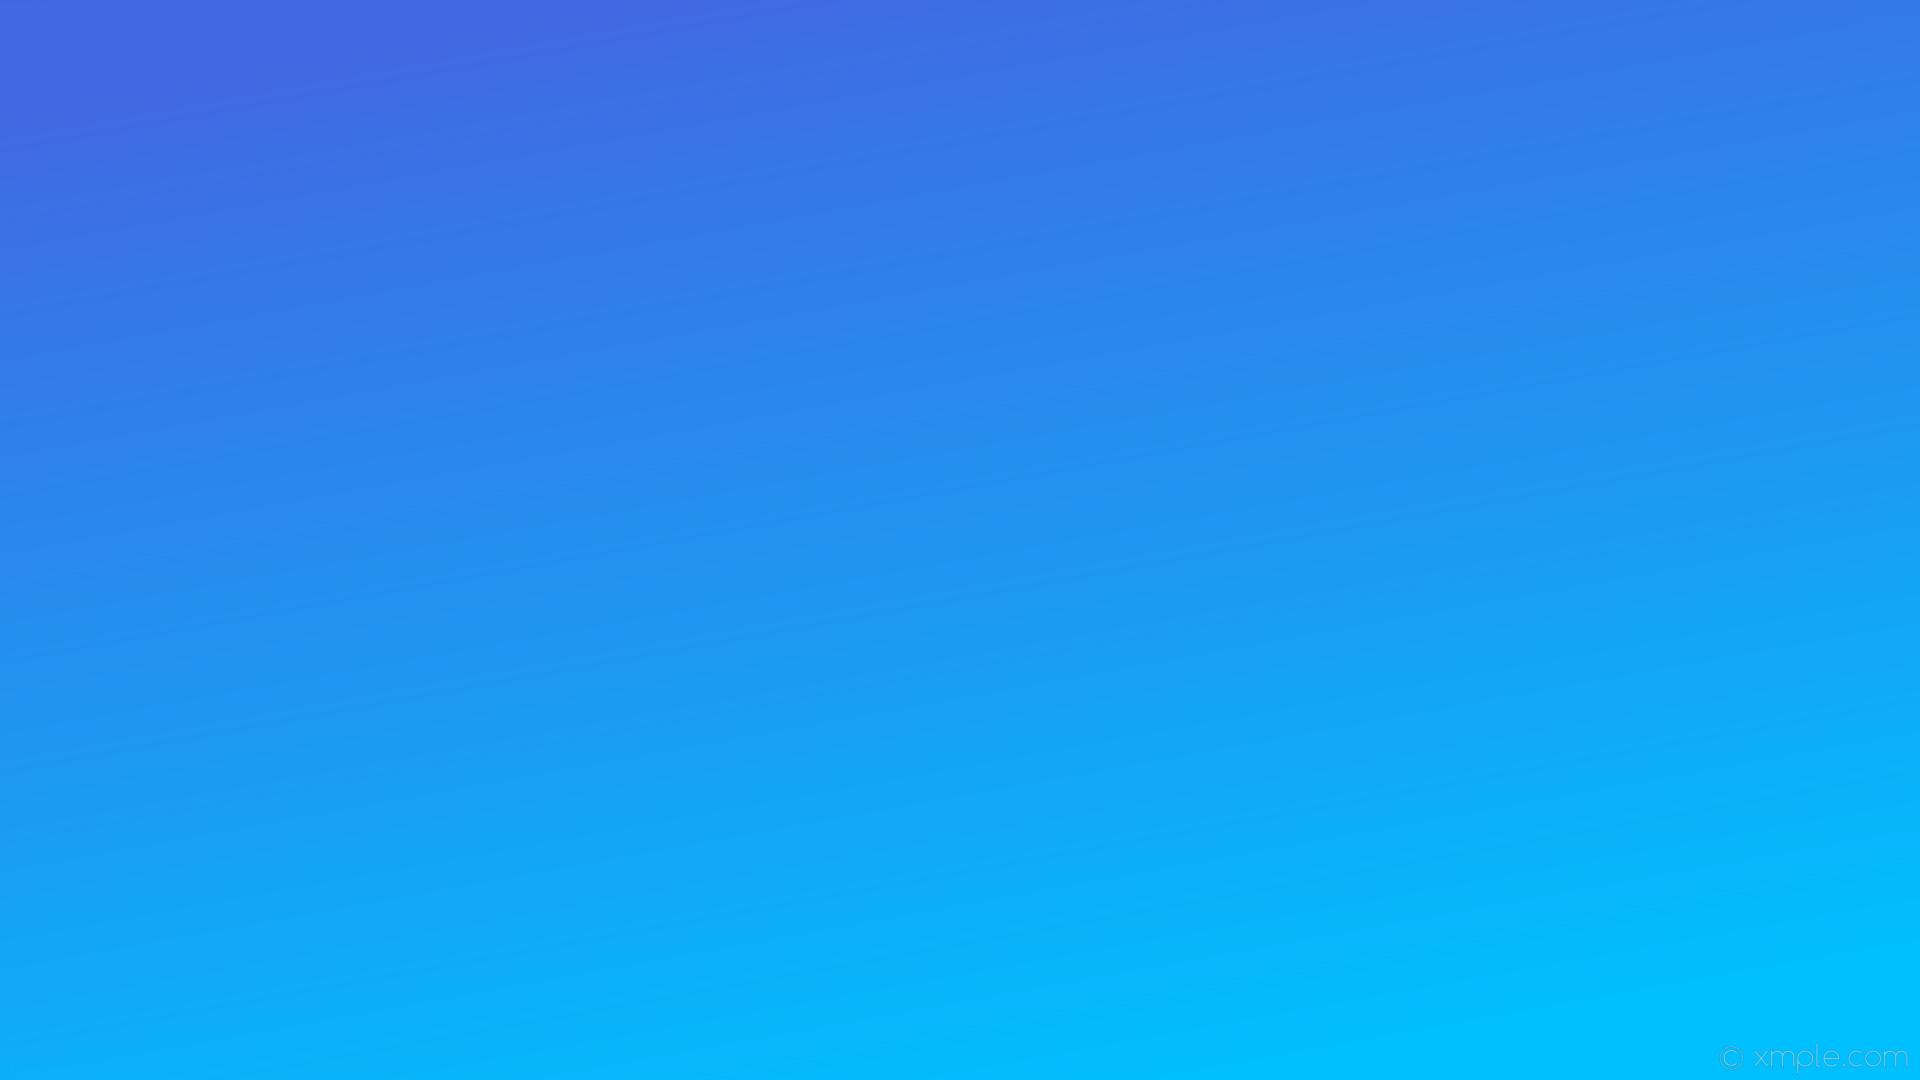 Res: 1920x1080, wallpaper blue gradient linear deep sky blue royal blue #00bfff #4169e1 300°